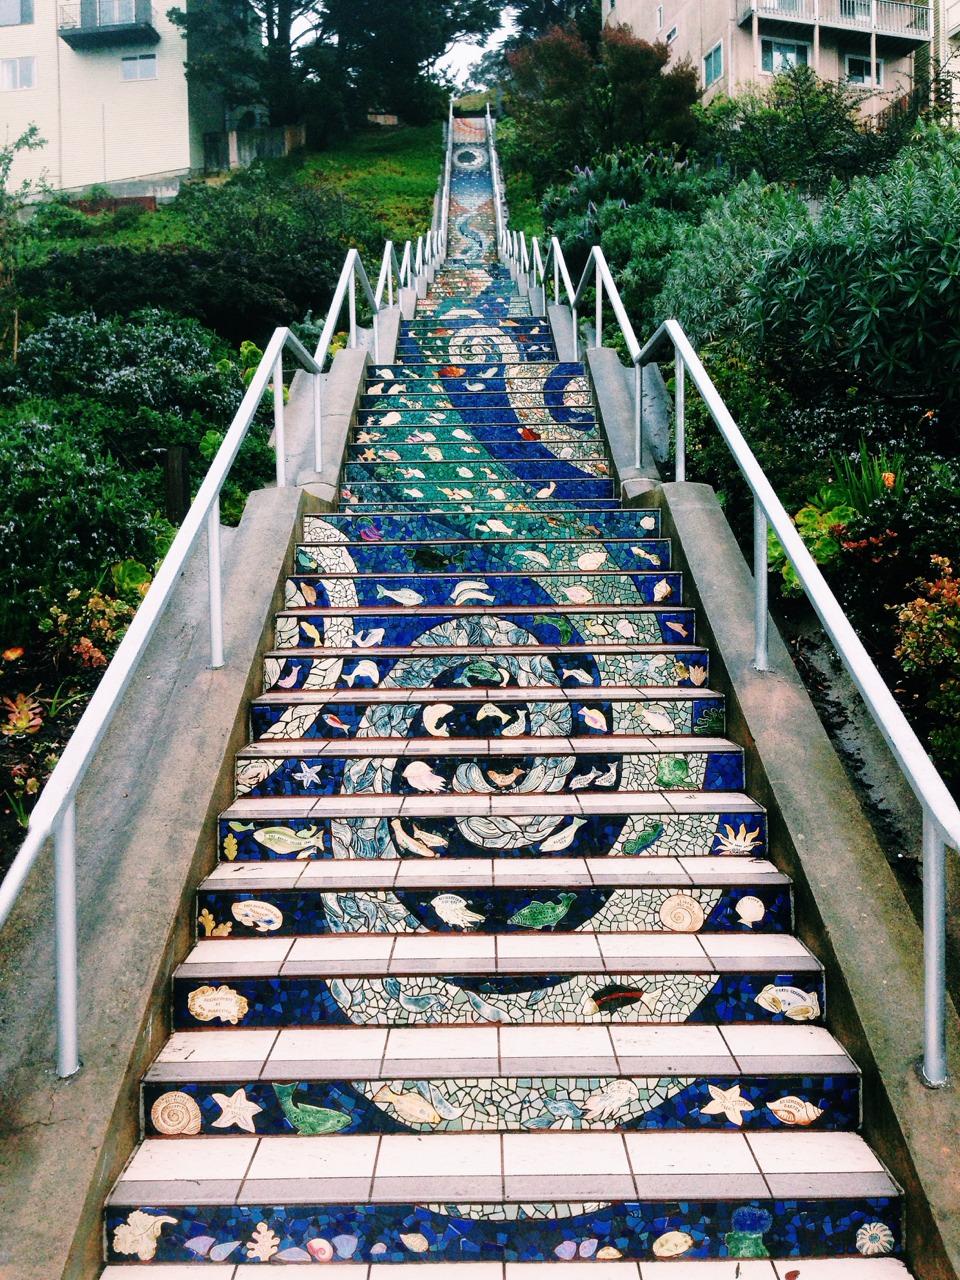 halfemptyoptimist :     16th Avenue Tiled Steps Project. San Francisco, Califas.